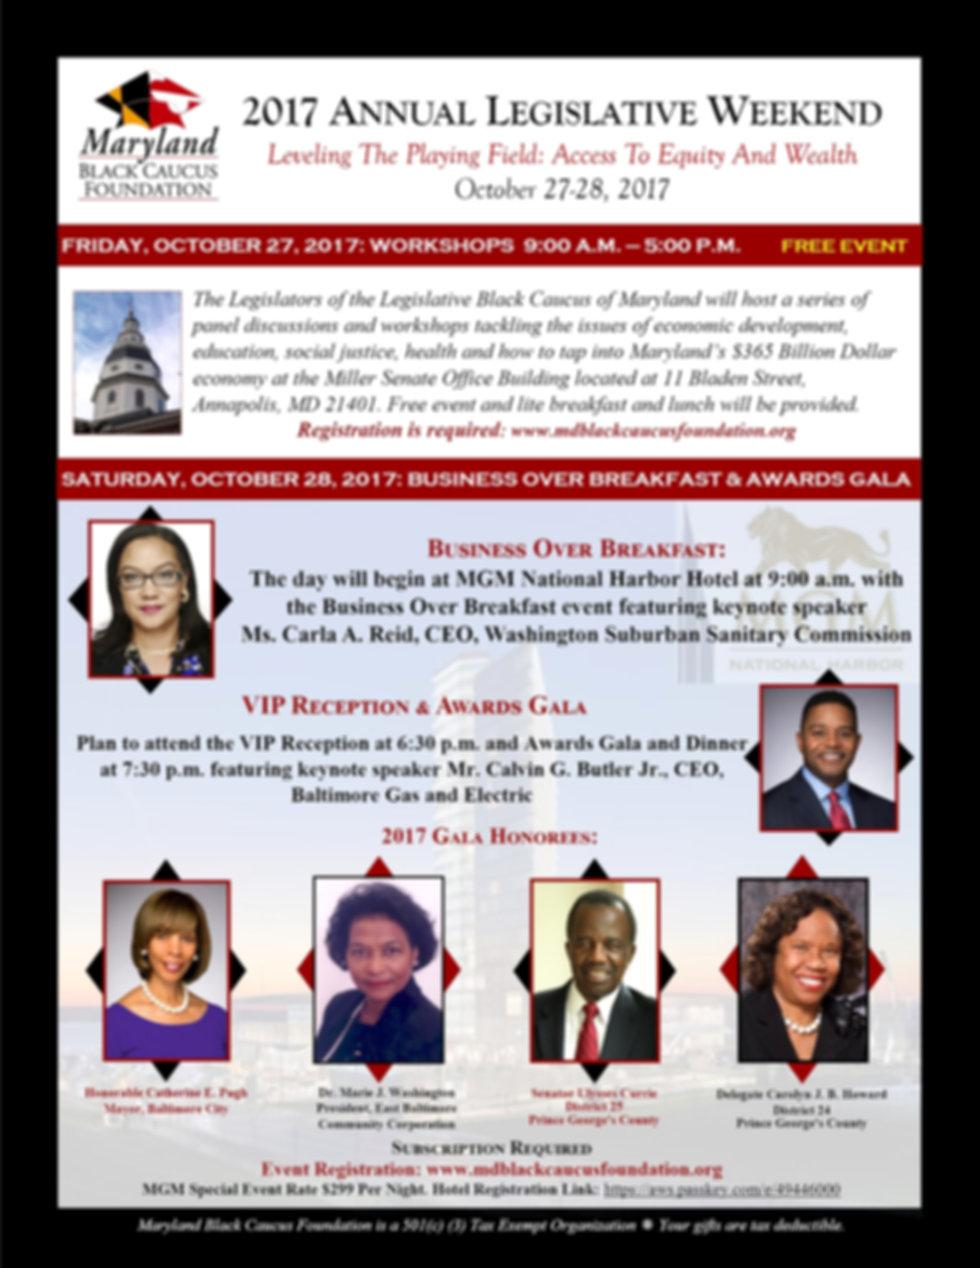 2017 Maryland Black Caucus Foundation Legislative Weekend